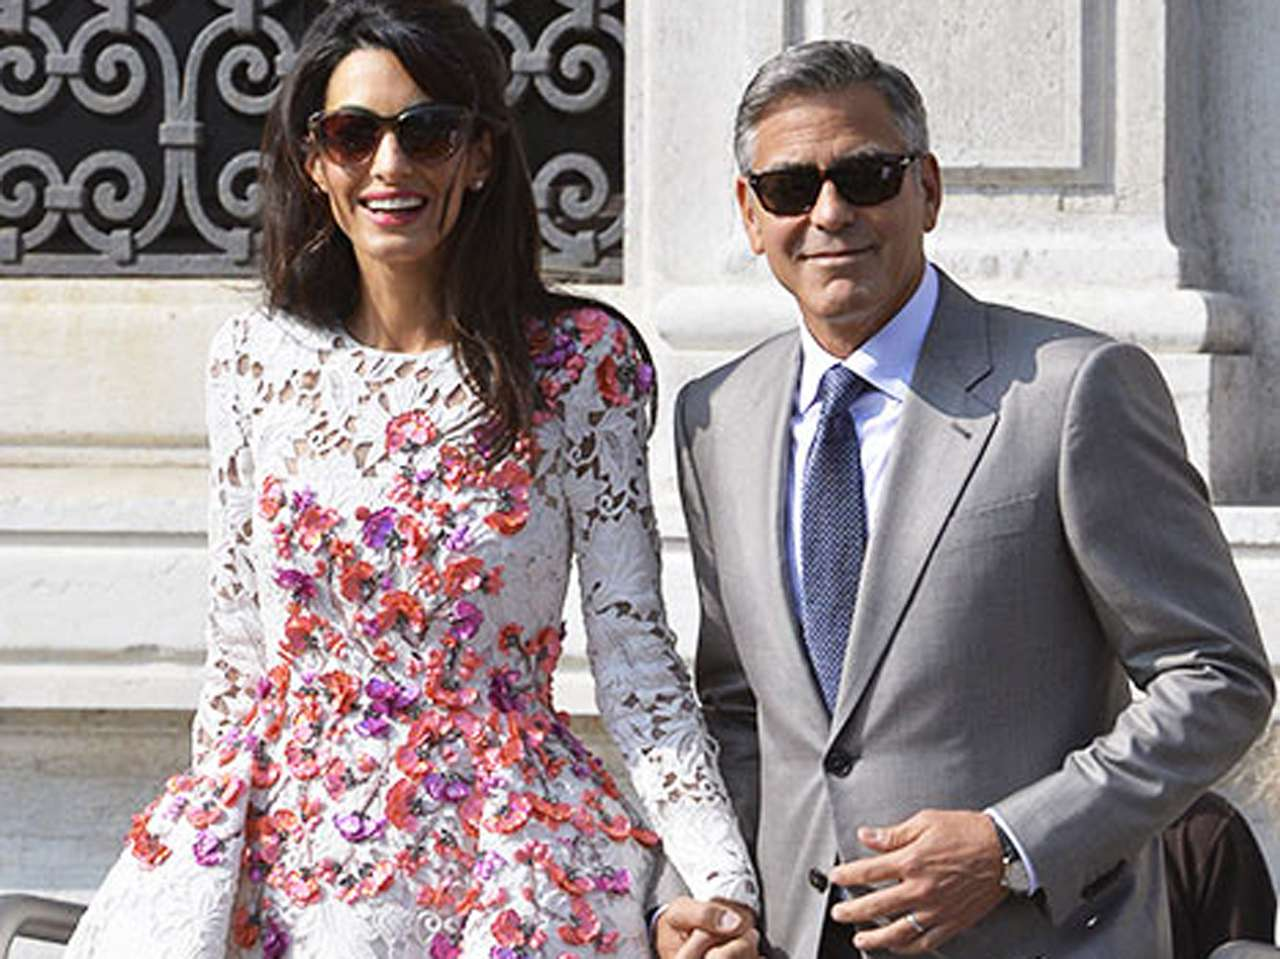 George Clooney y Amal Alamudin. Foto: AFP en español